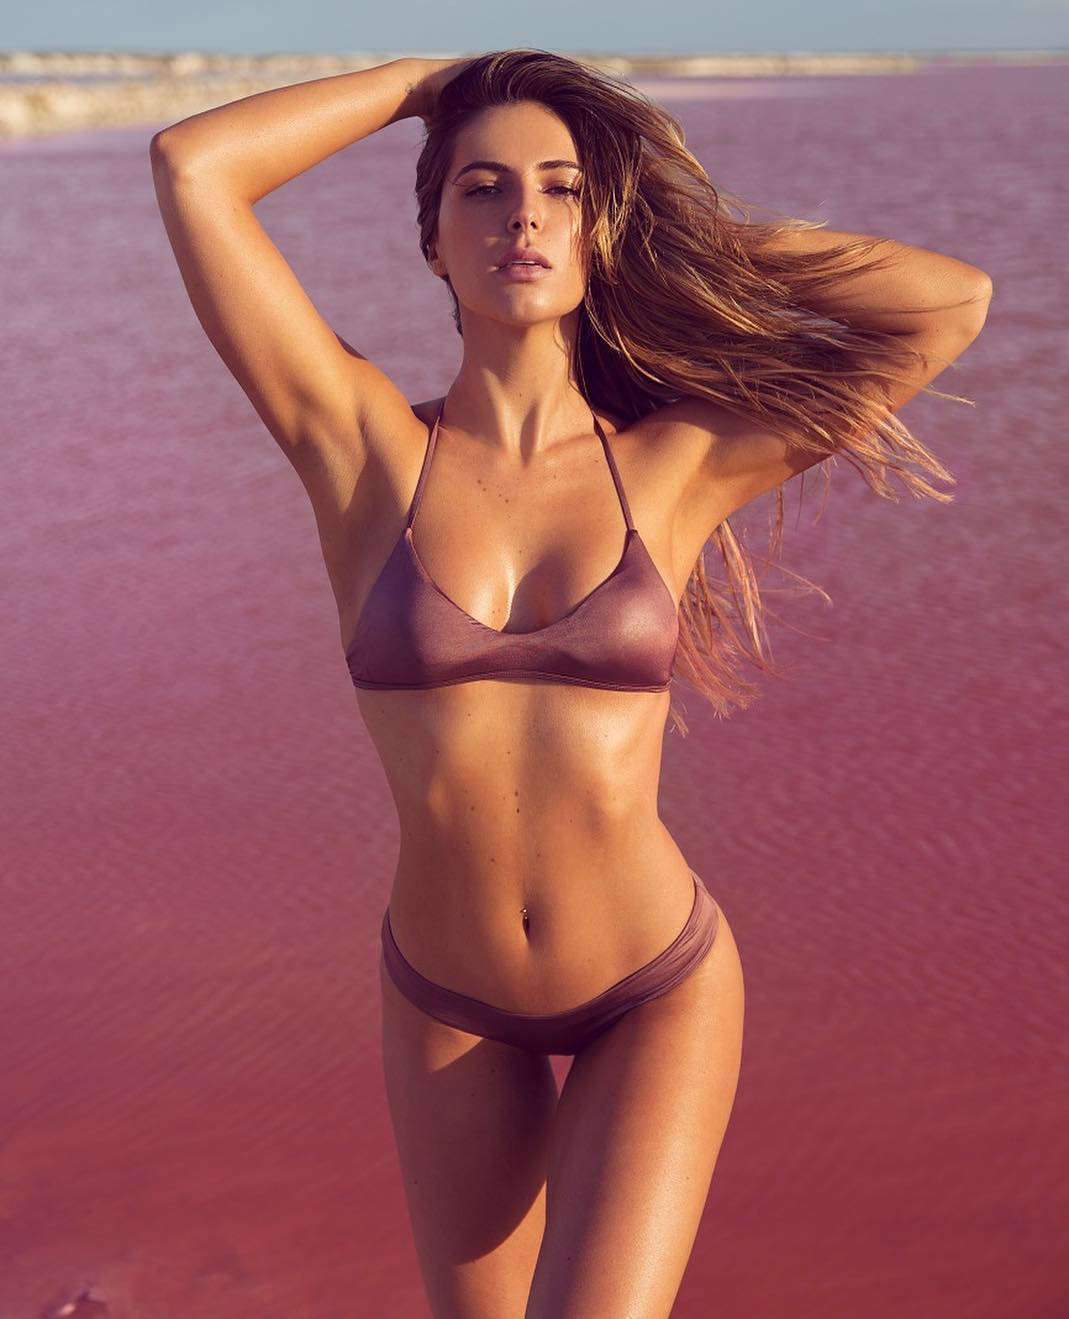 Bikini Brittny Ward nude (89 photos), Tits, Paparazzi, Boobs, legs 2015